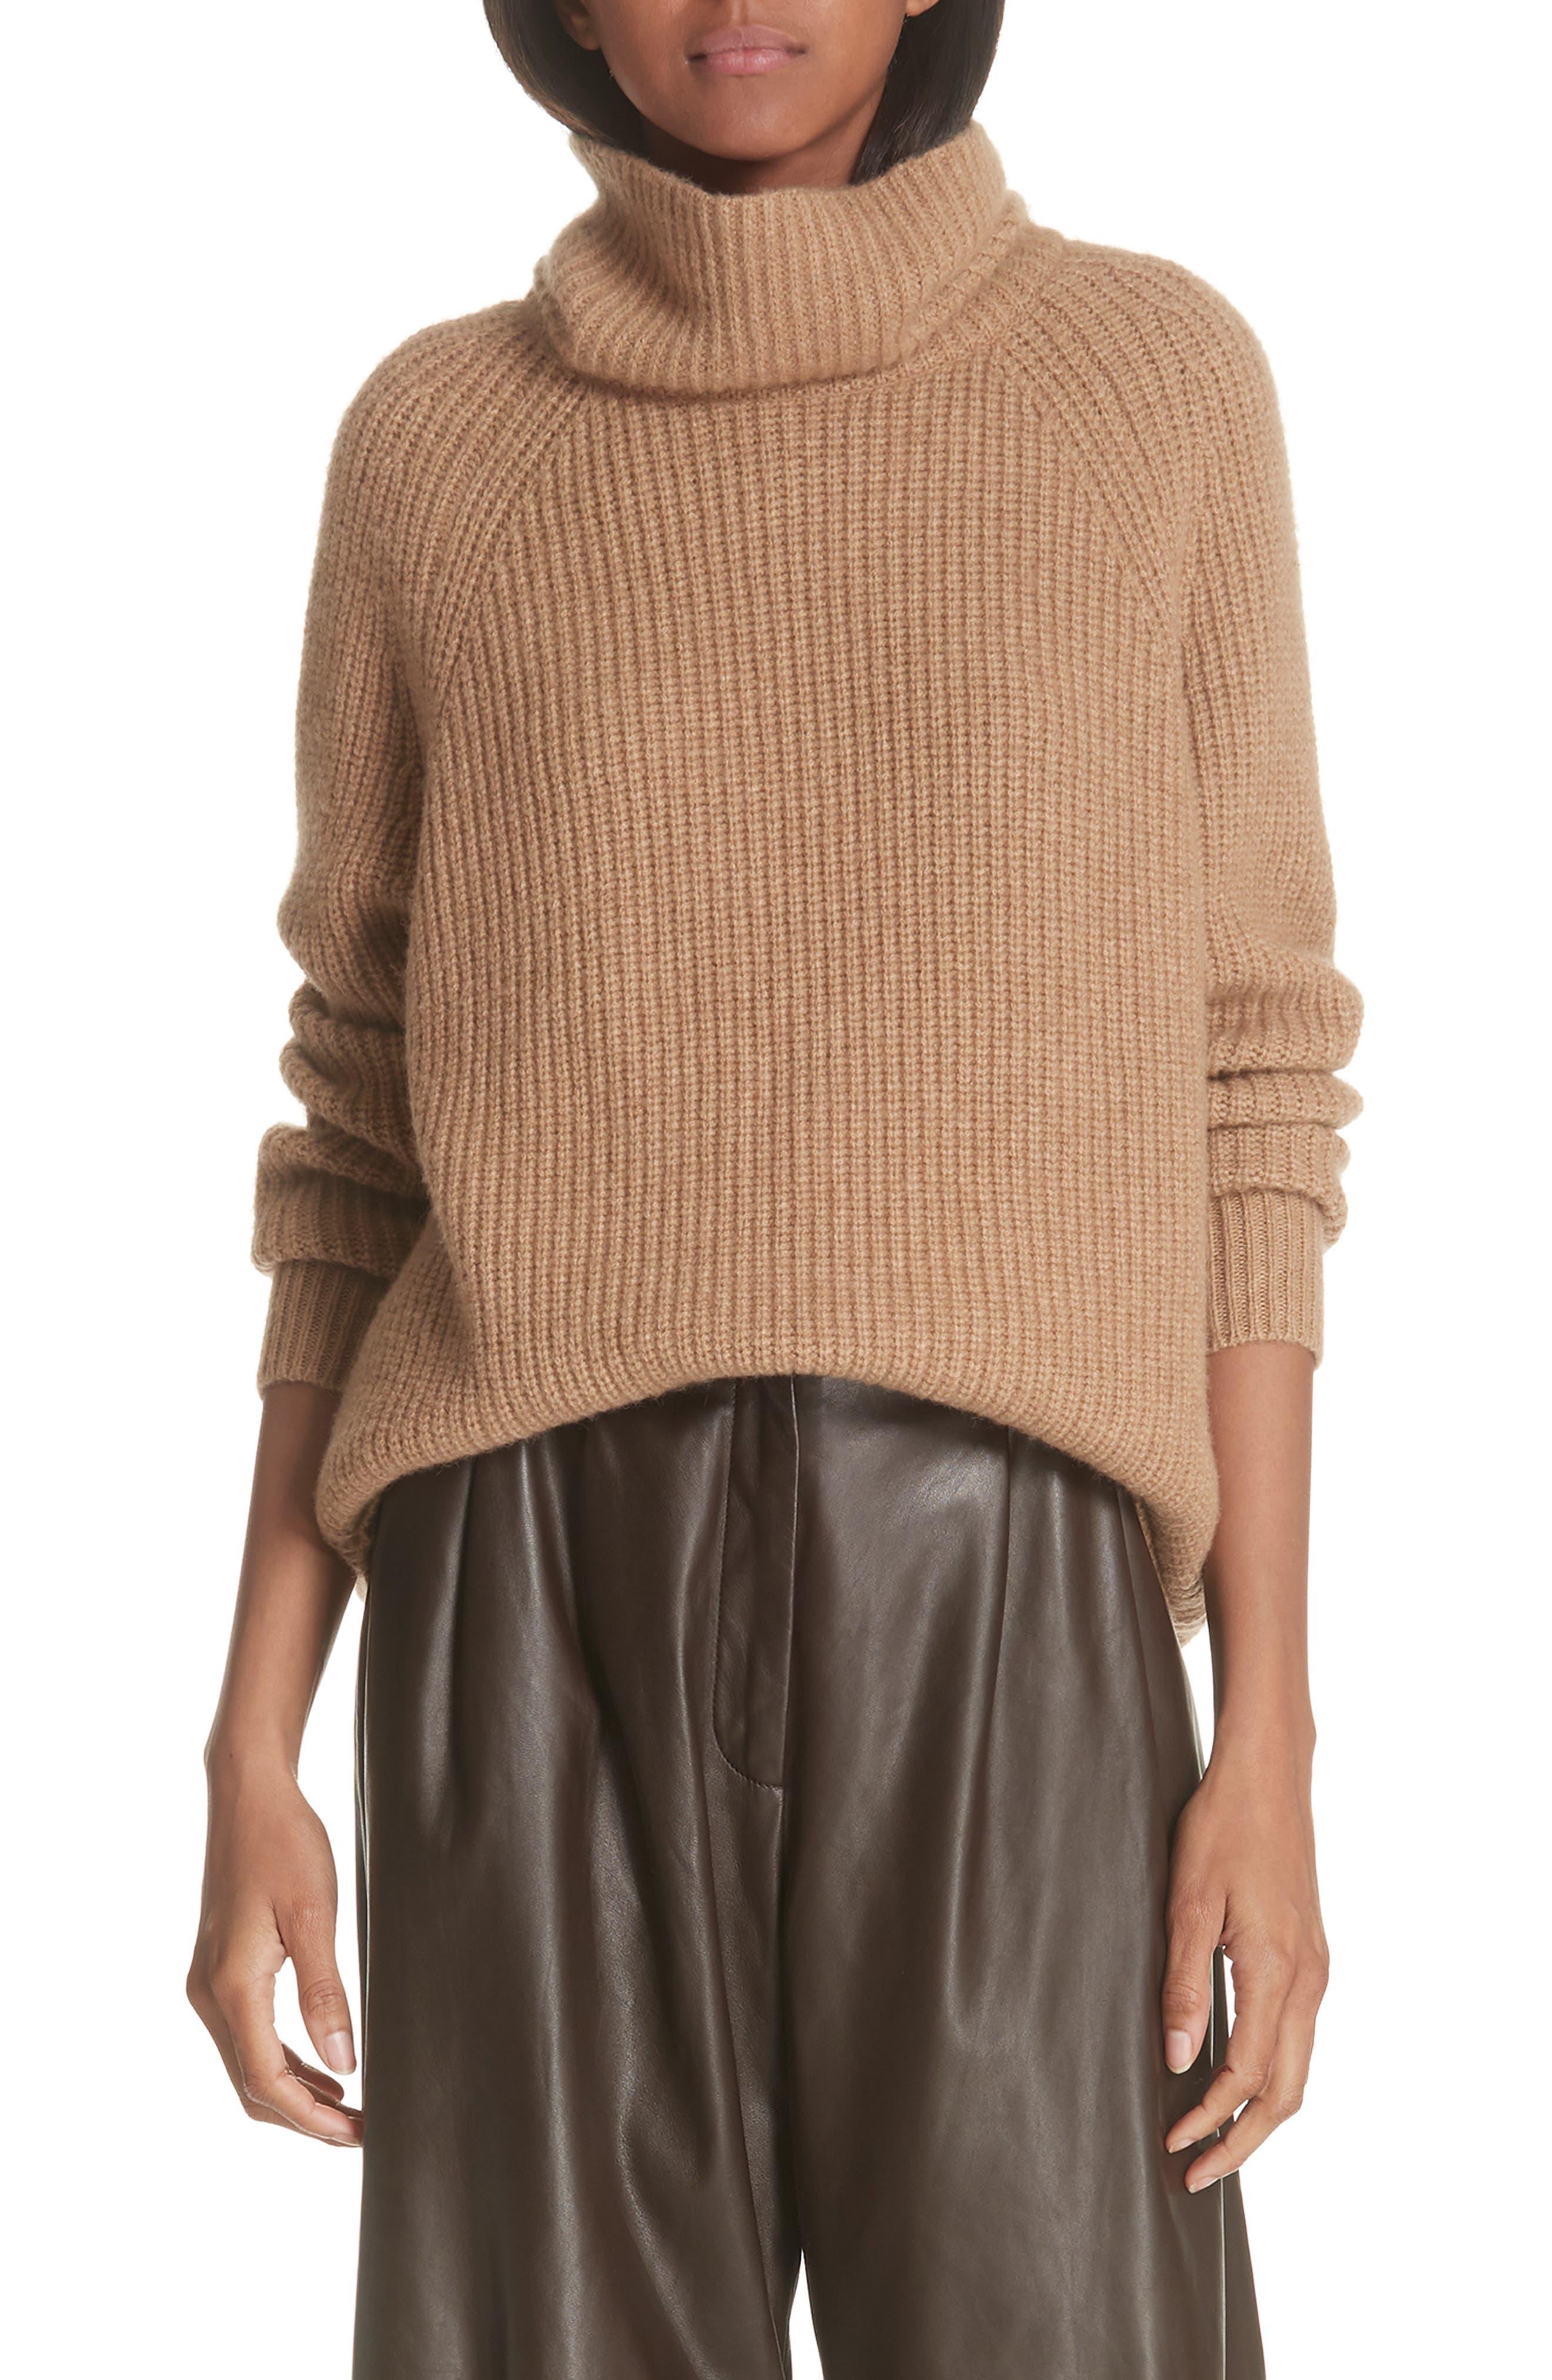 NILI LOTAN Anitra Rib Knit Turtleneck Sweater, Main, color, 261